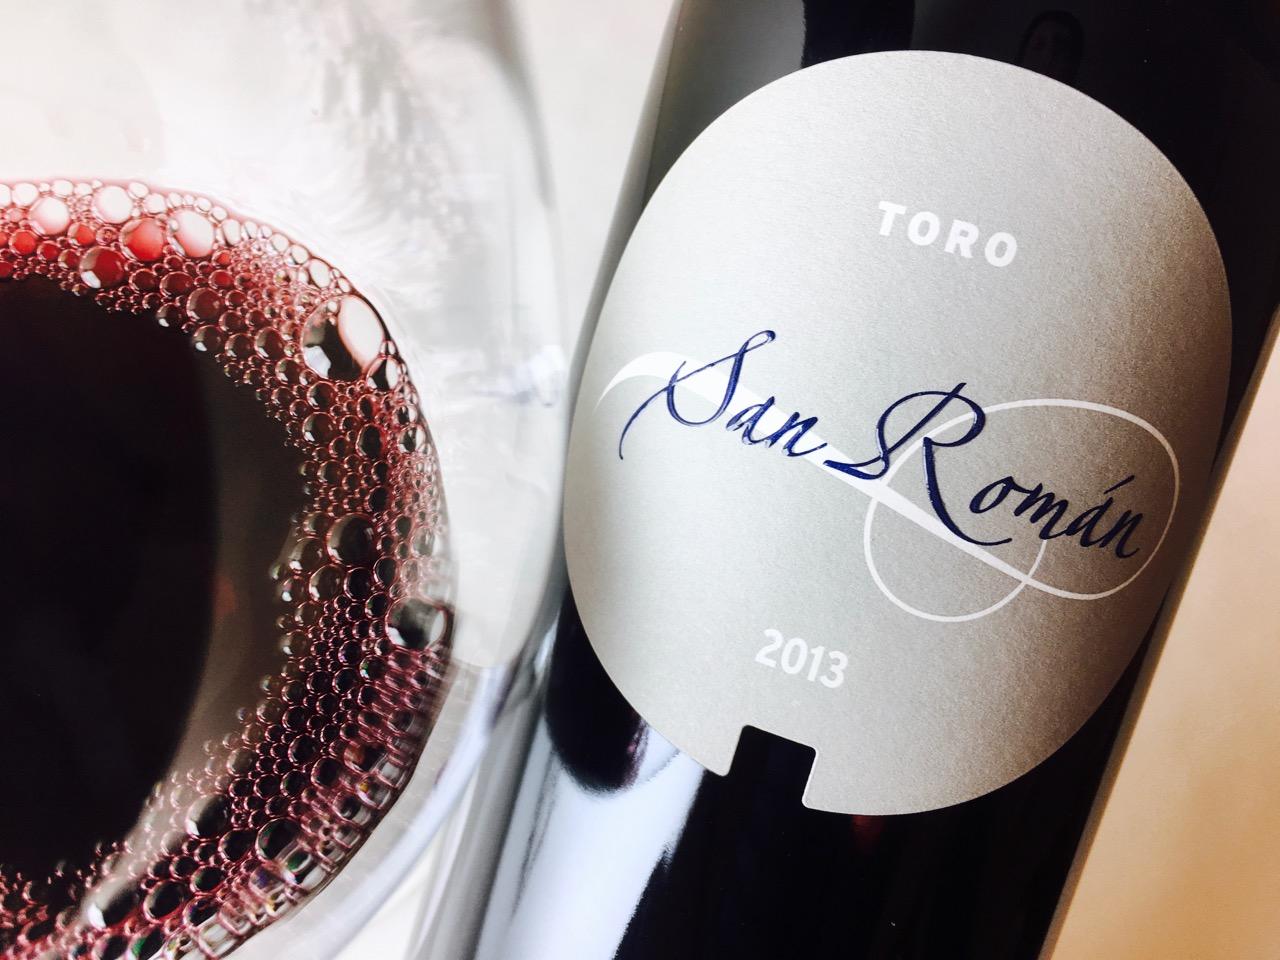 2013 San Roman Toro DO